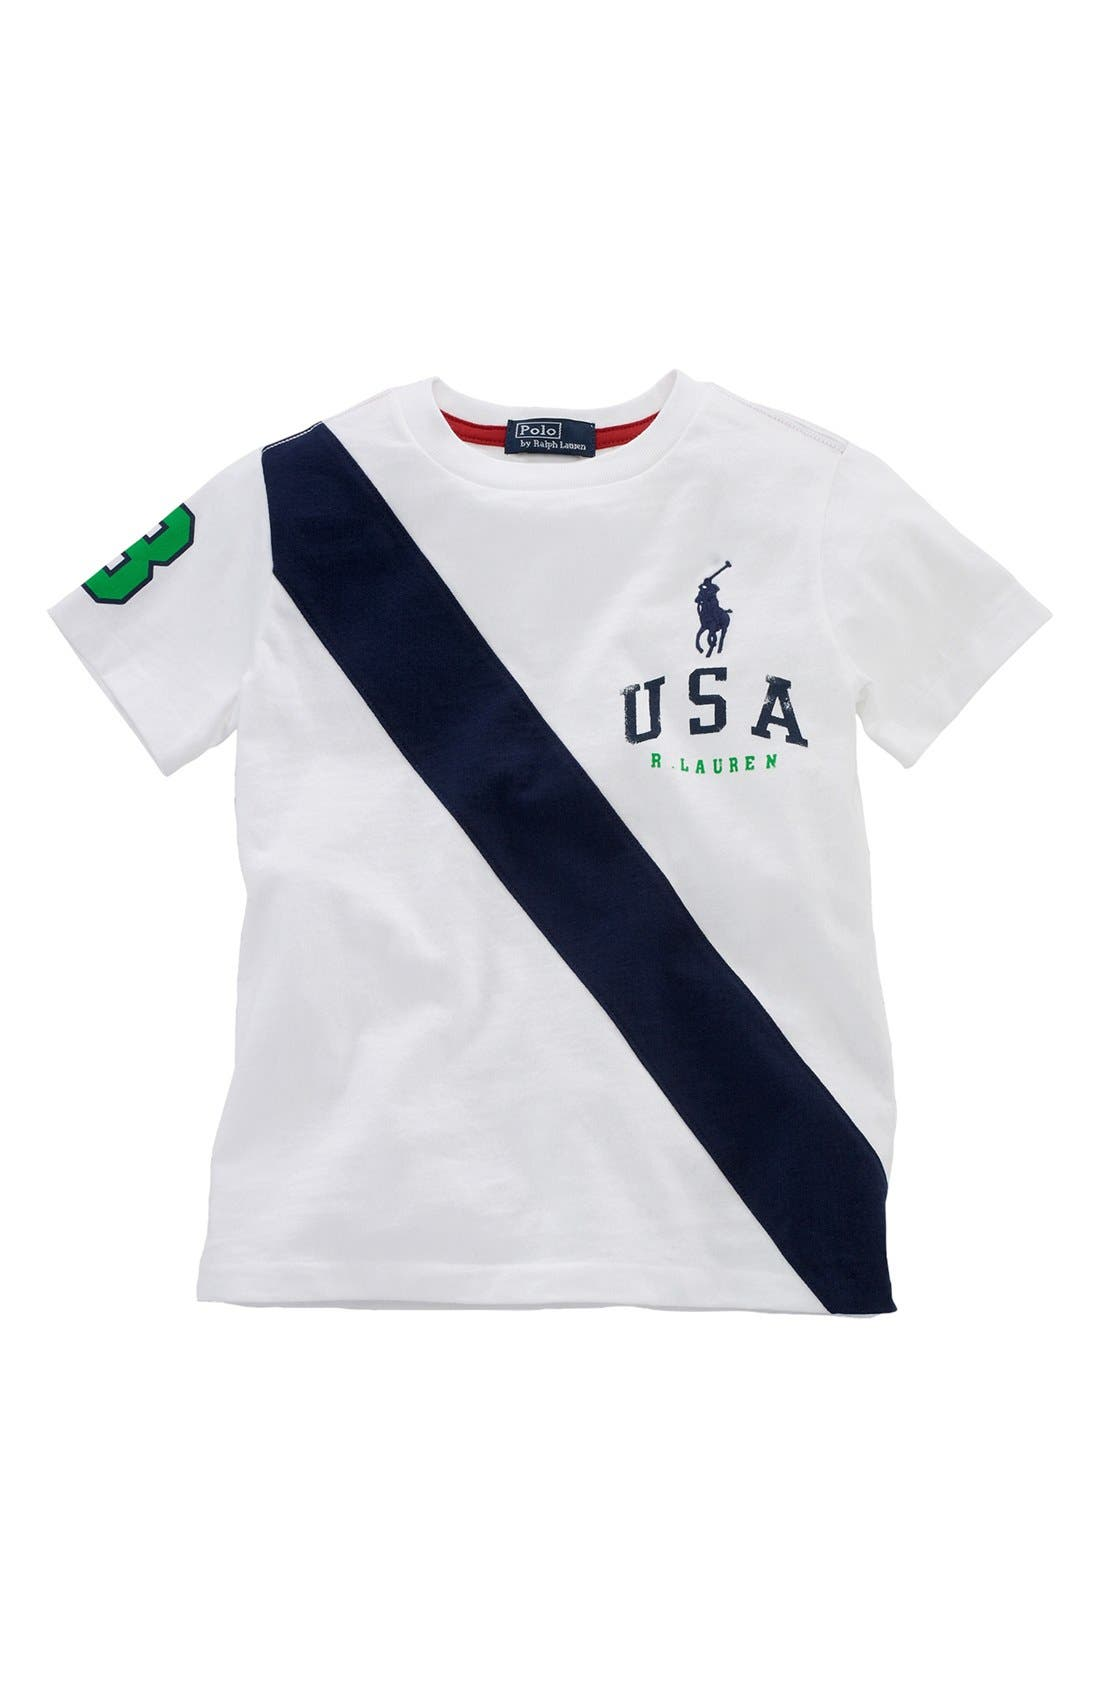 Main Image - Polo Ralph Lauren 'USA Banner' T-Shirt (Toddler)